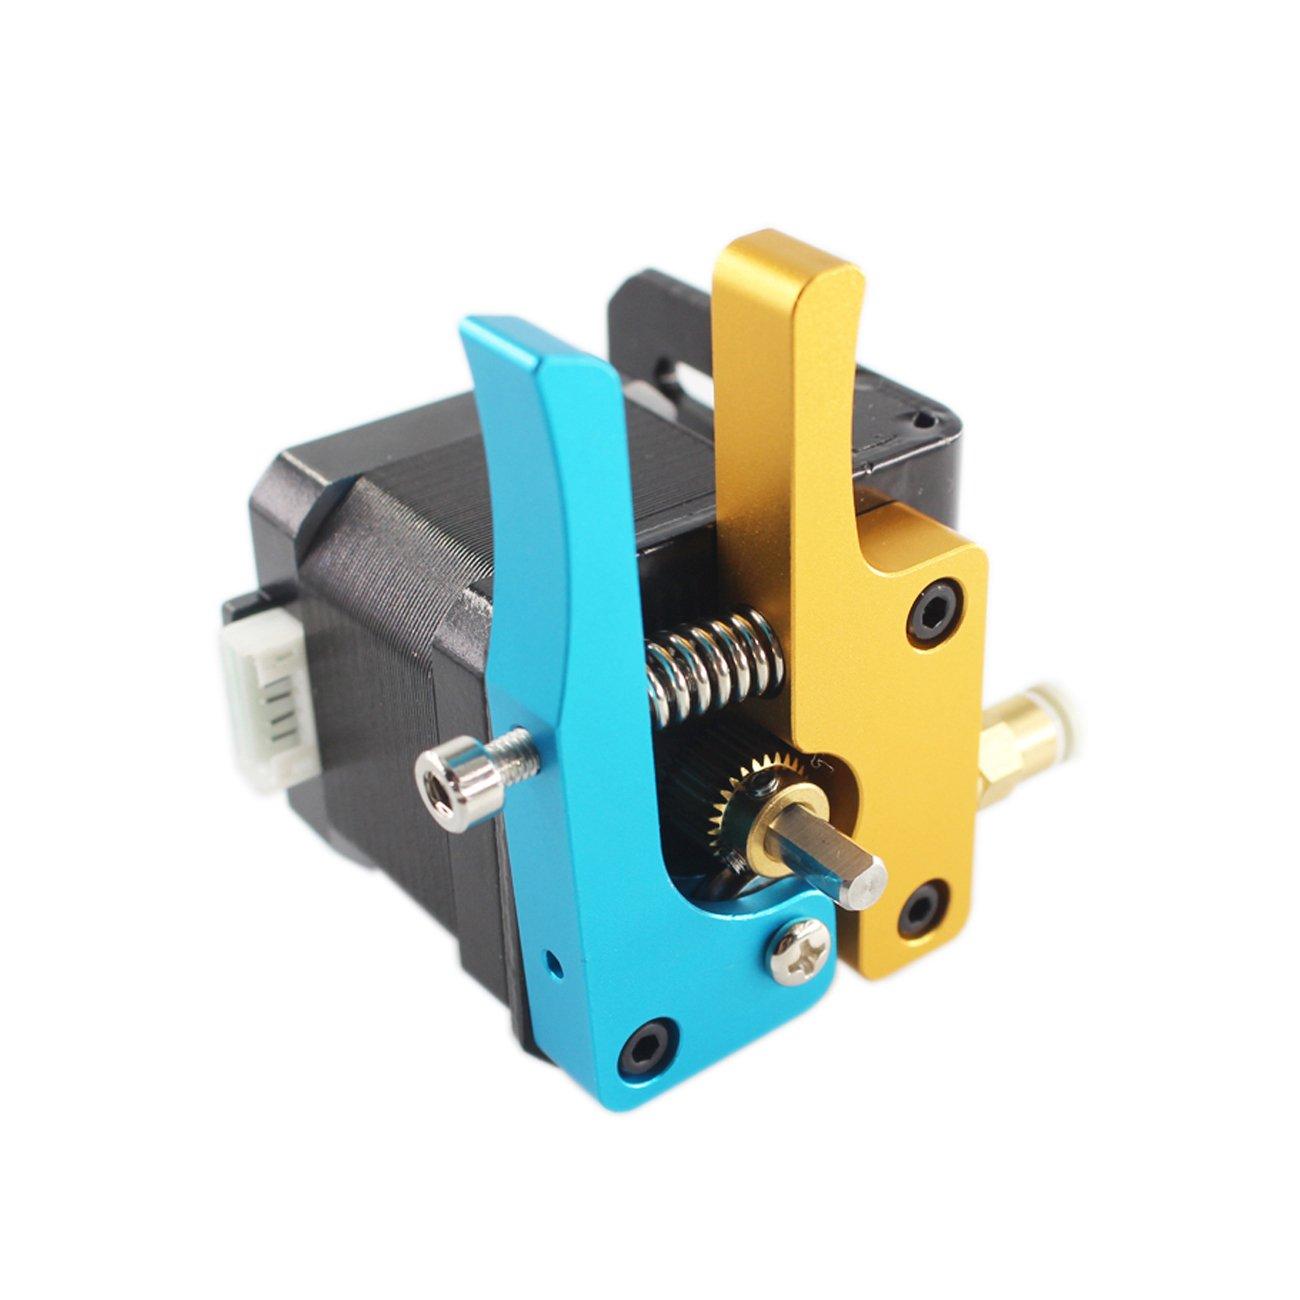 winsinn 3D Drucker Upgrade Bowdenzug MK8 Extruder Hotend Kit Treiber Feeder –  Fü r 1, 75 mm Dü se Filament –  tevo Anet A8 RepRap Prusa i3 MakerBot Zubehö r Teile WINSINN Technolog